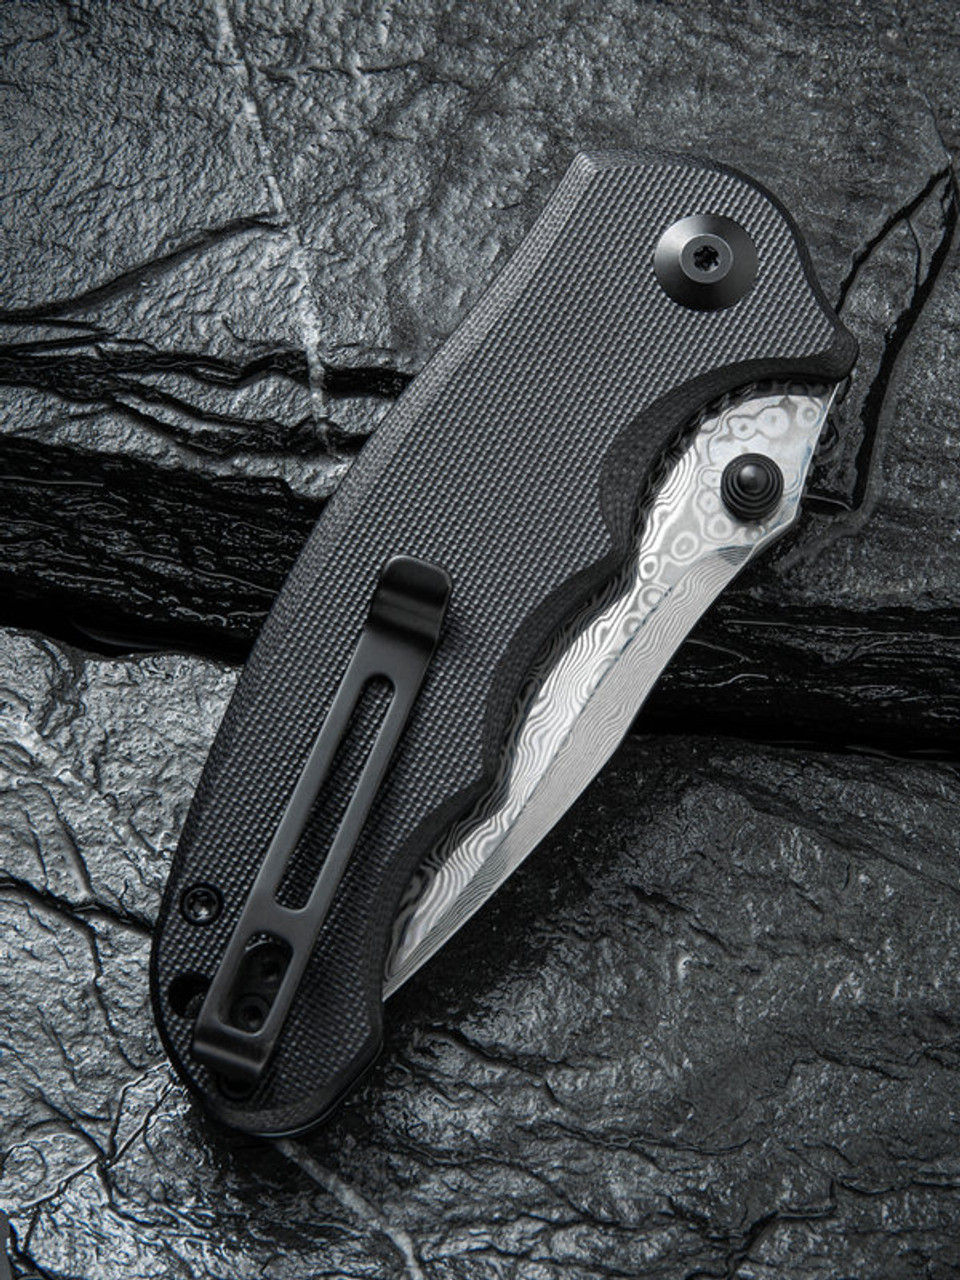 "Civivi Hooligan Linerlock Folder C913DS1, 2.98"" Drop Point Damascus  Blade, Black G-10 Handle"